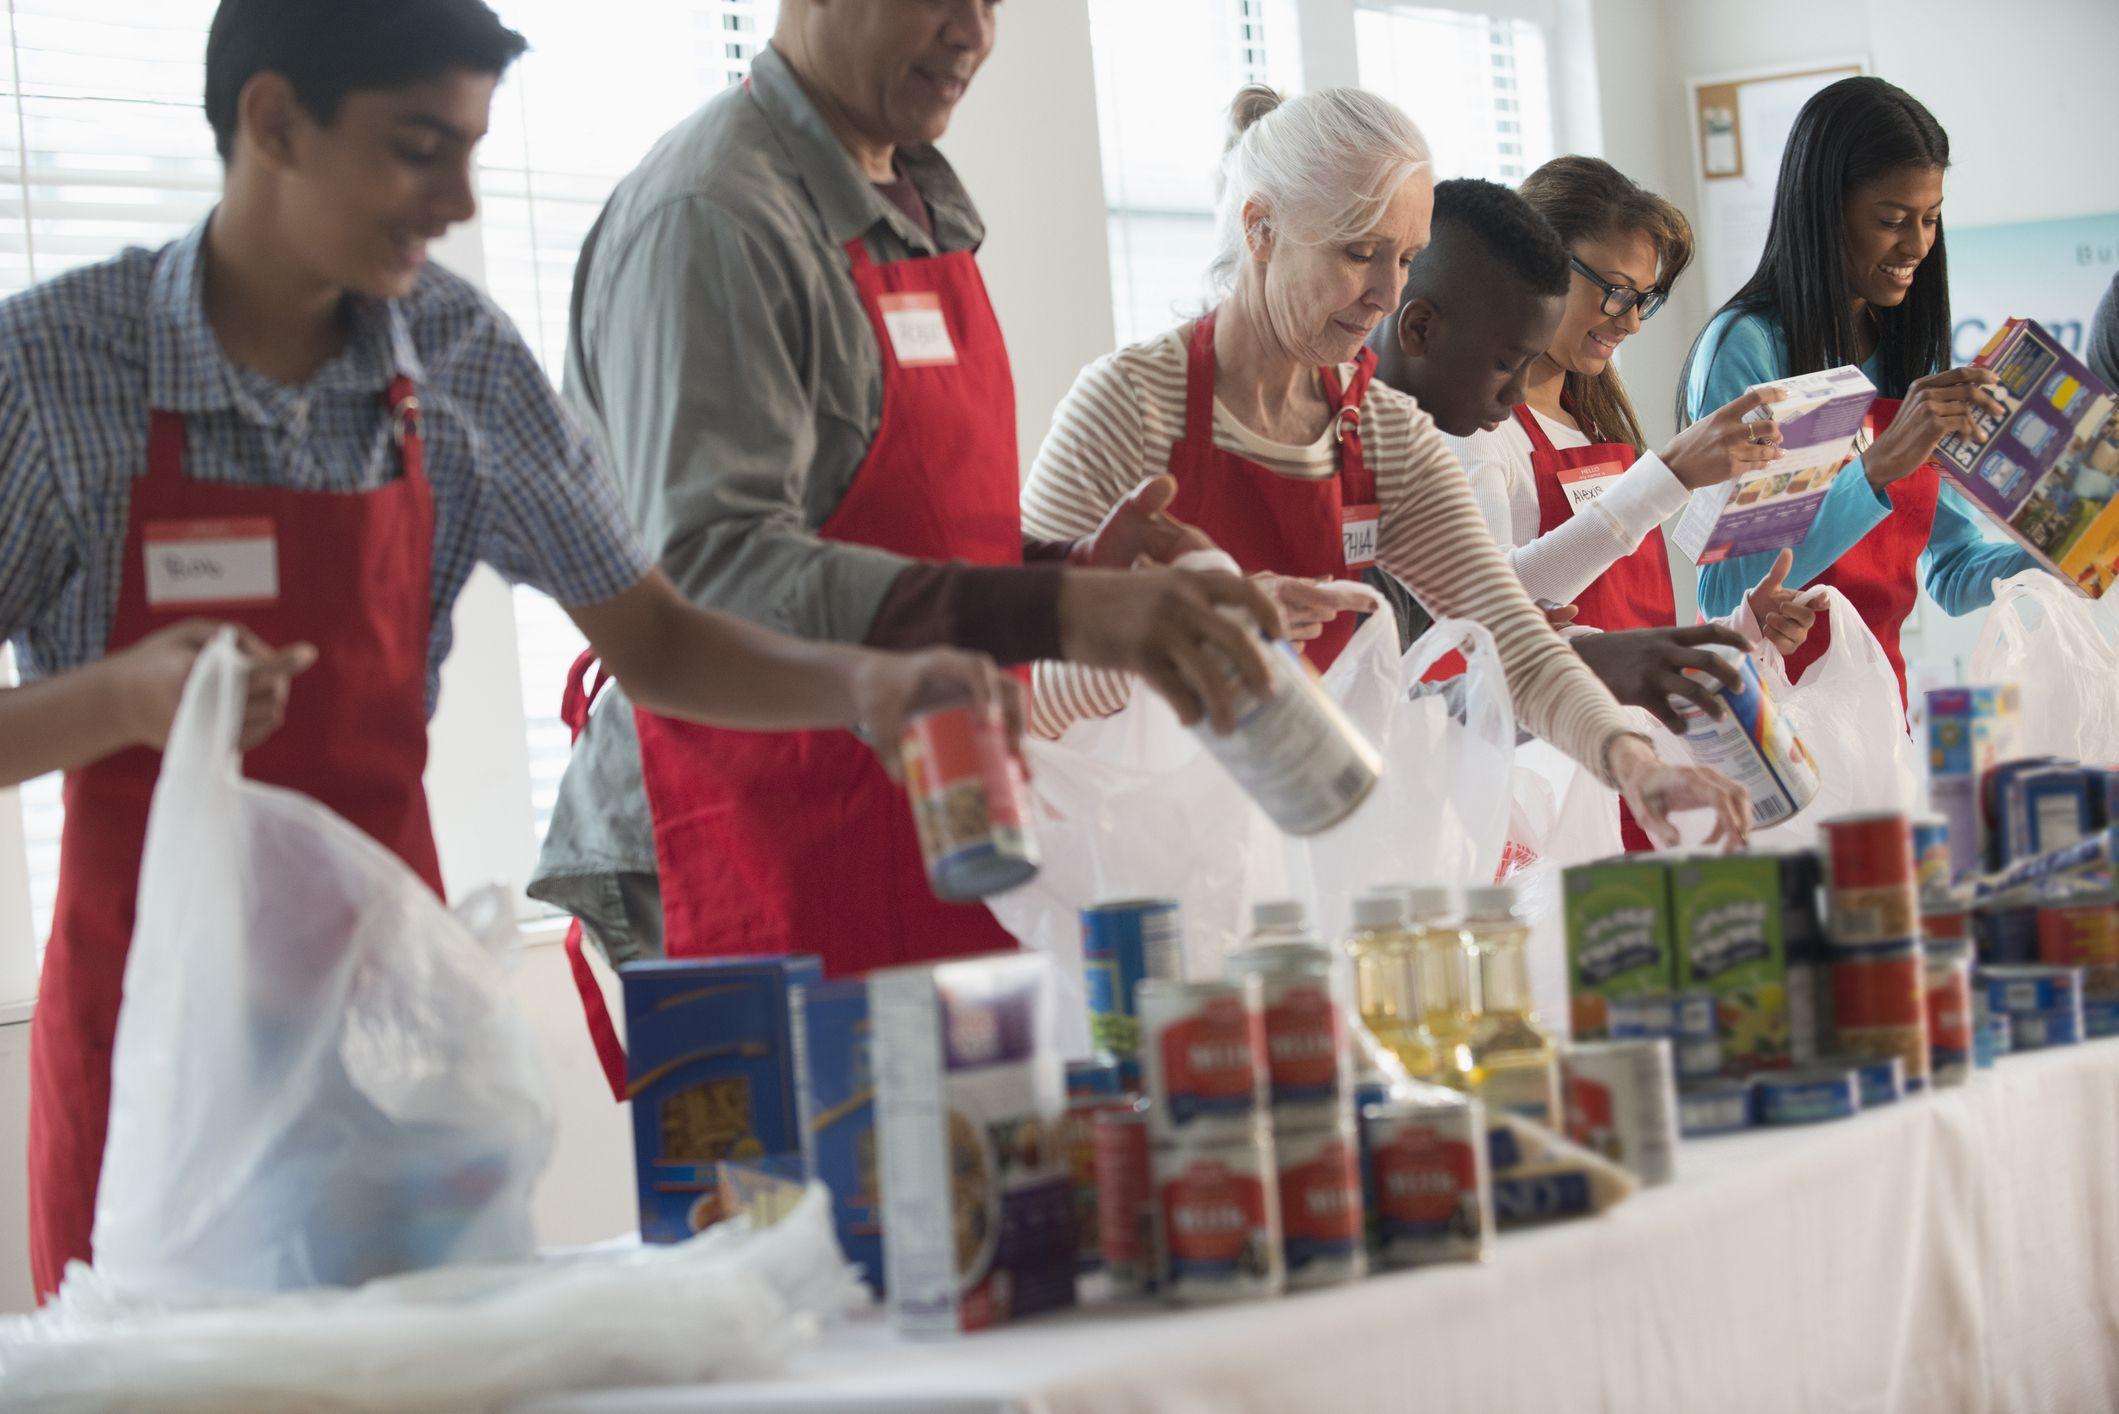 Finding Power and Purpose Through Volunteering